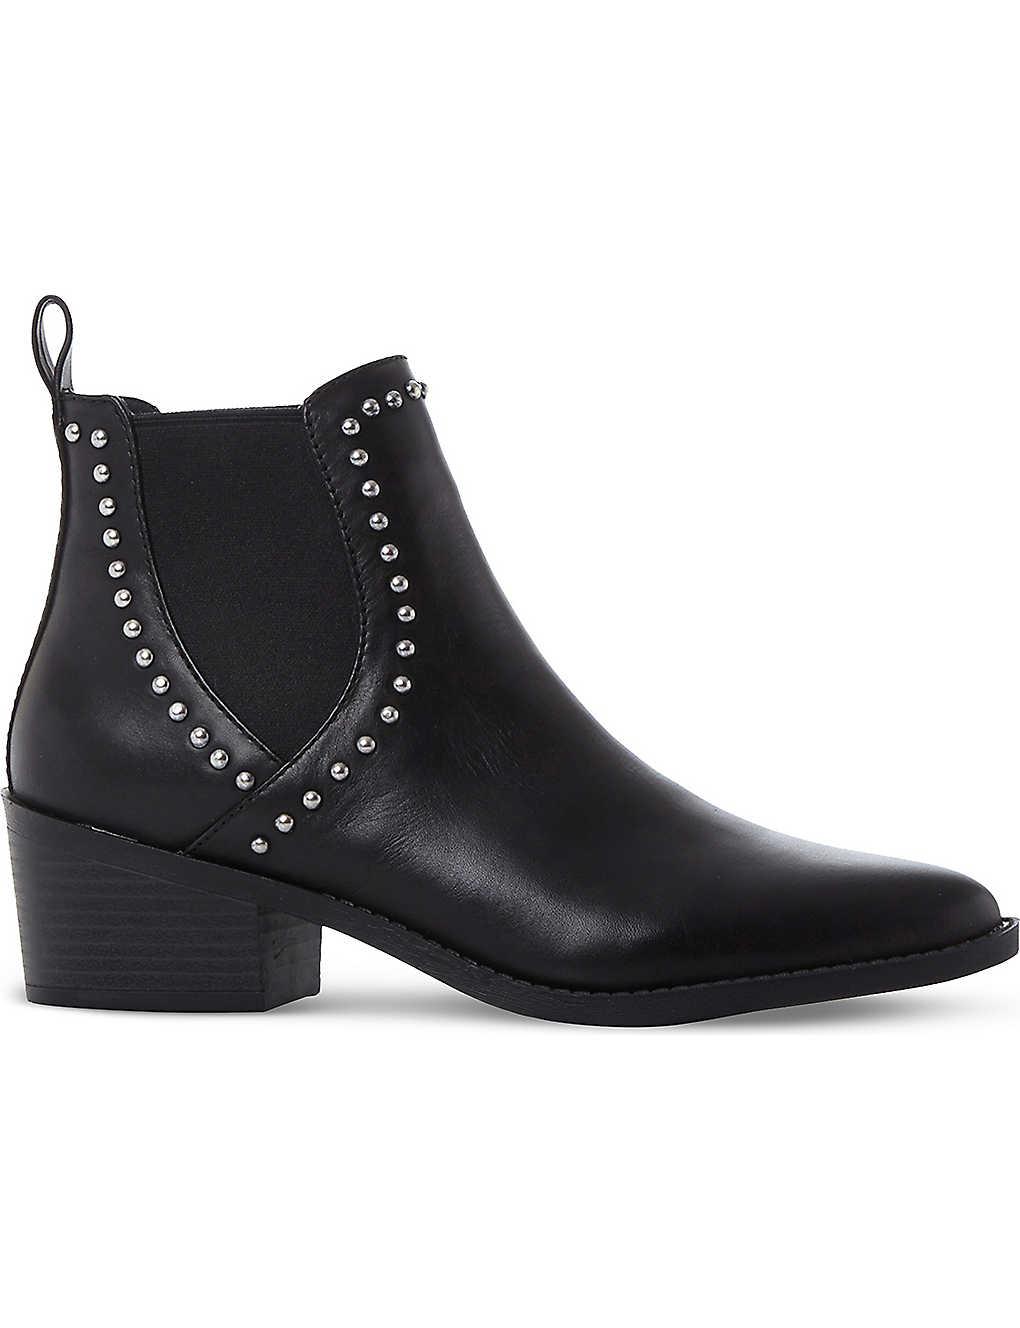 dfe272ada STEVE MADDEN - Studded leather Chelsea boots | Selfridges.com